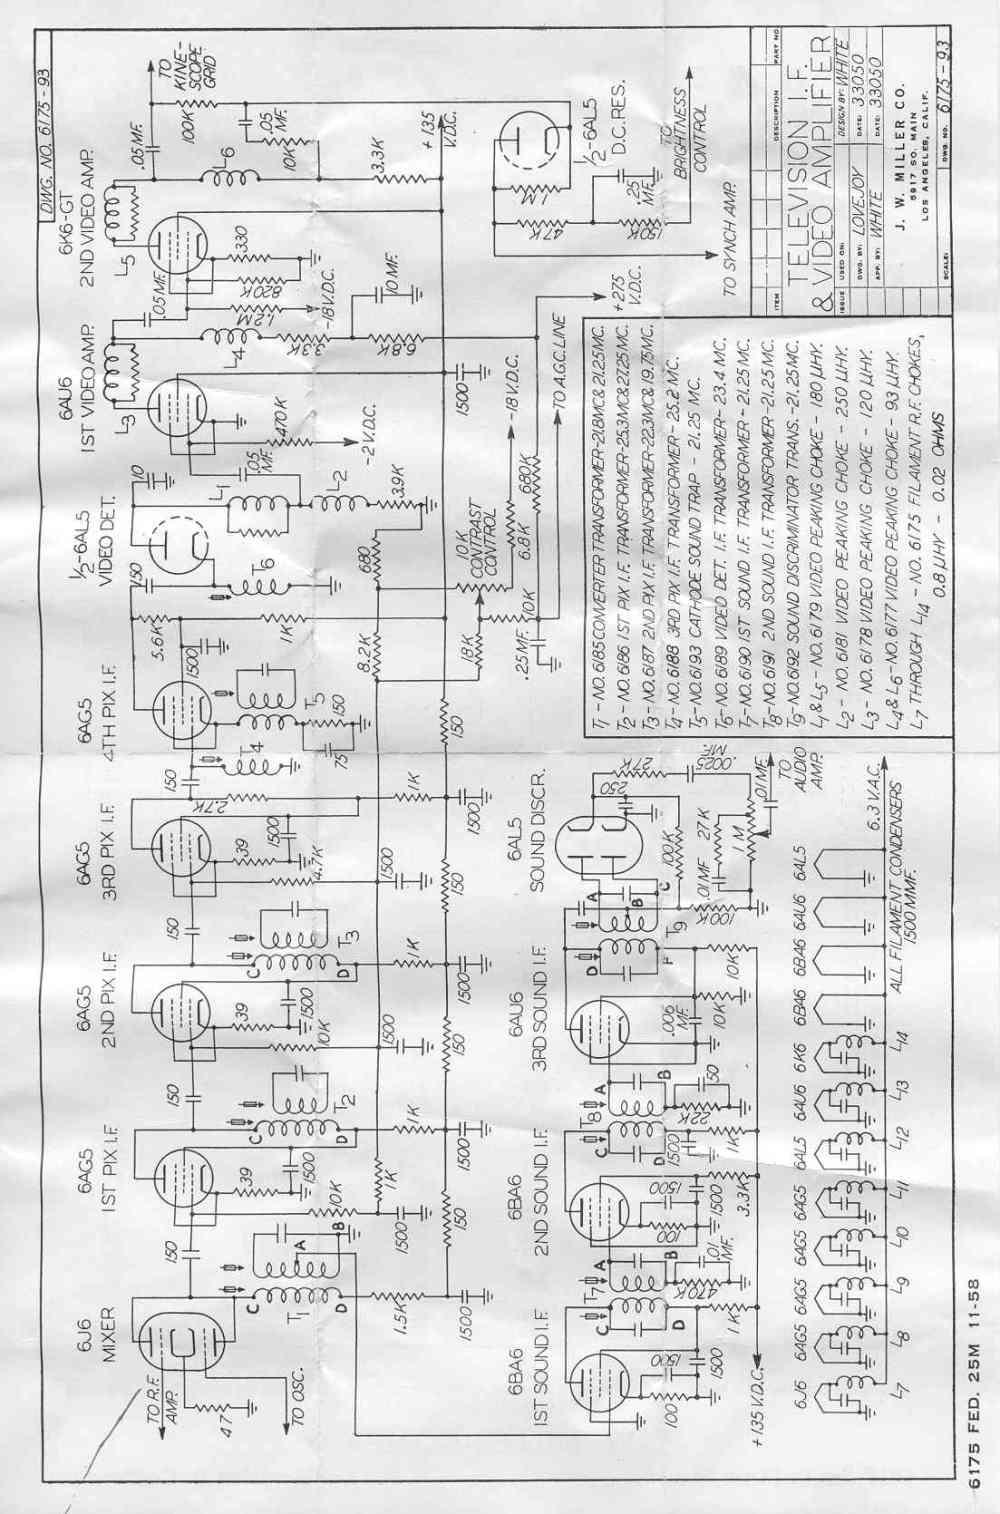 medium resolution of case 446 wiring harness case garden tractor wiring diagram case 446 garden tractor wiring diagram 446